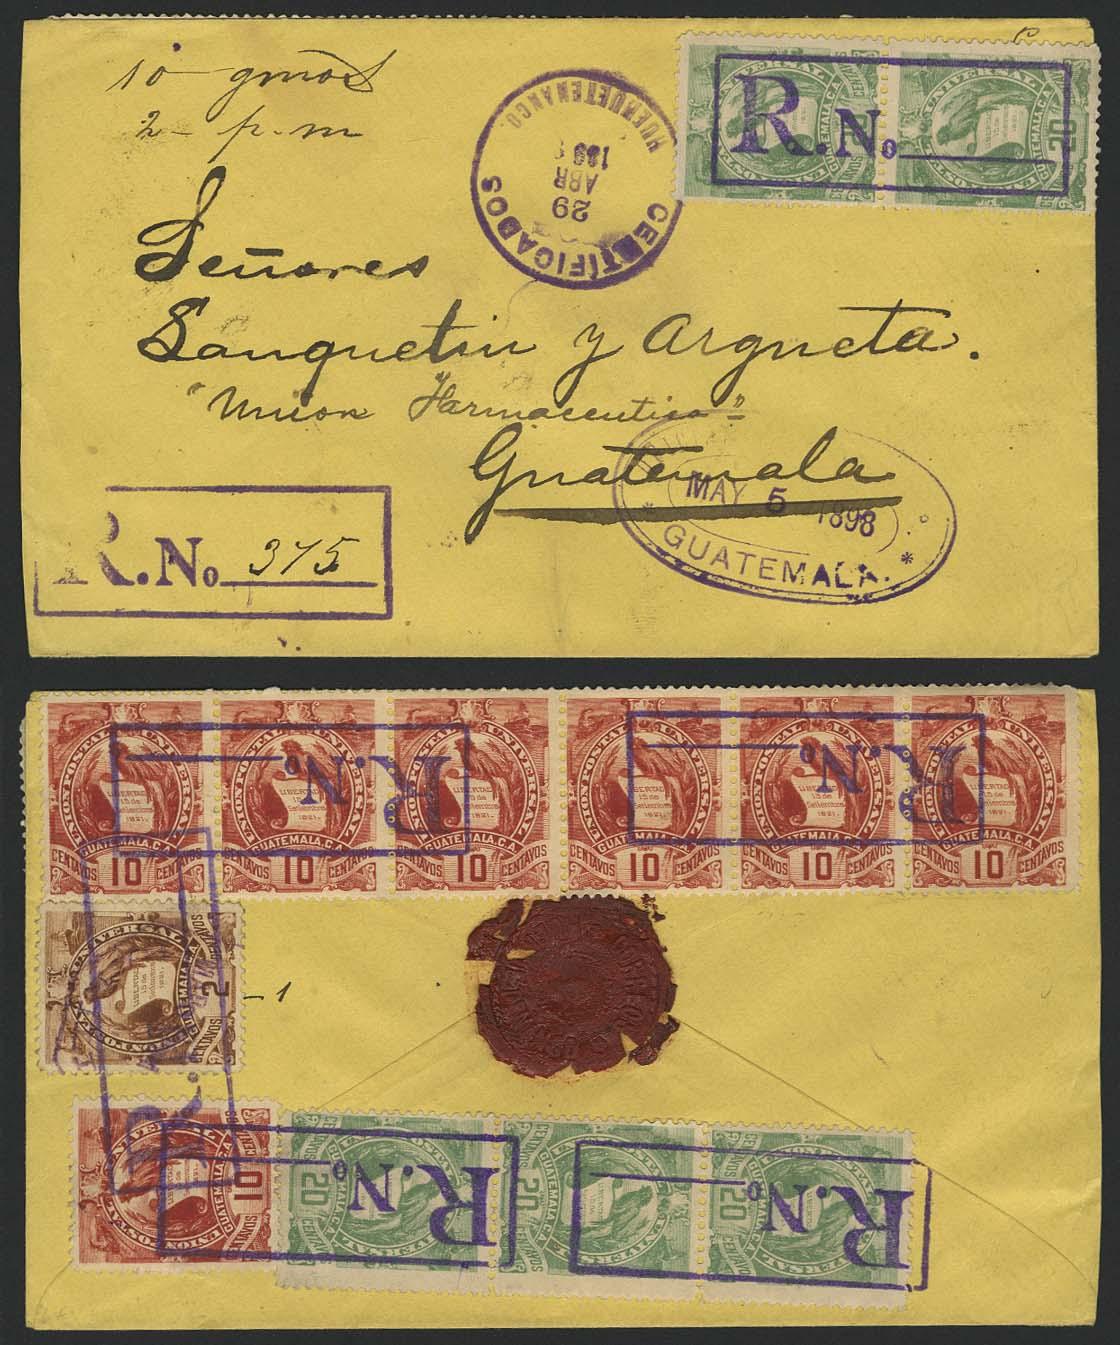 Lot 5047 - Übersee A-Z Guatemala - Markenausgaben -  Auktionshaus Ulrich Felzmann GmbH & Co. KG